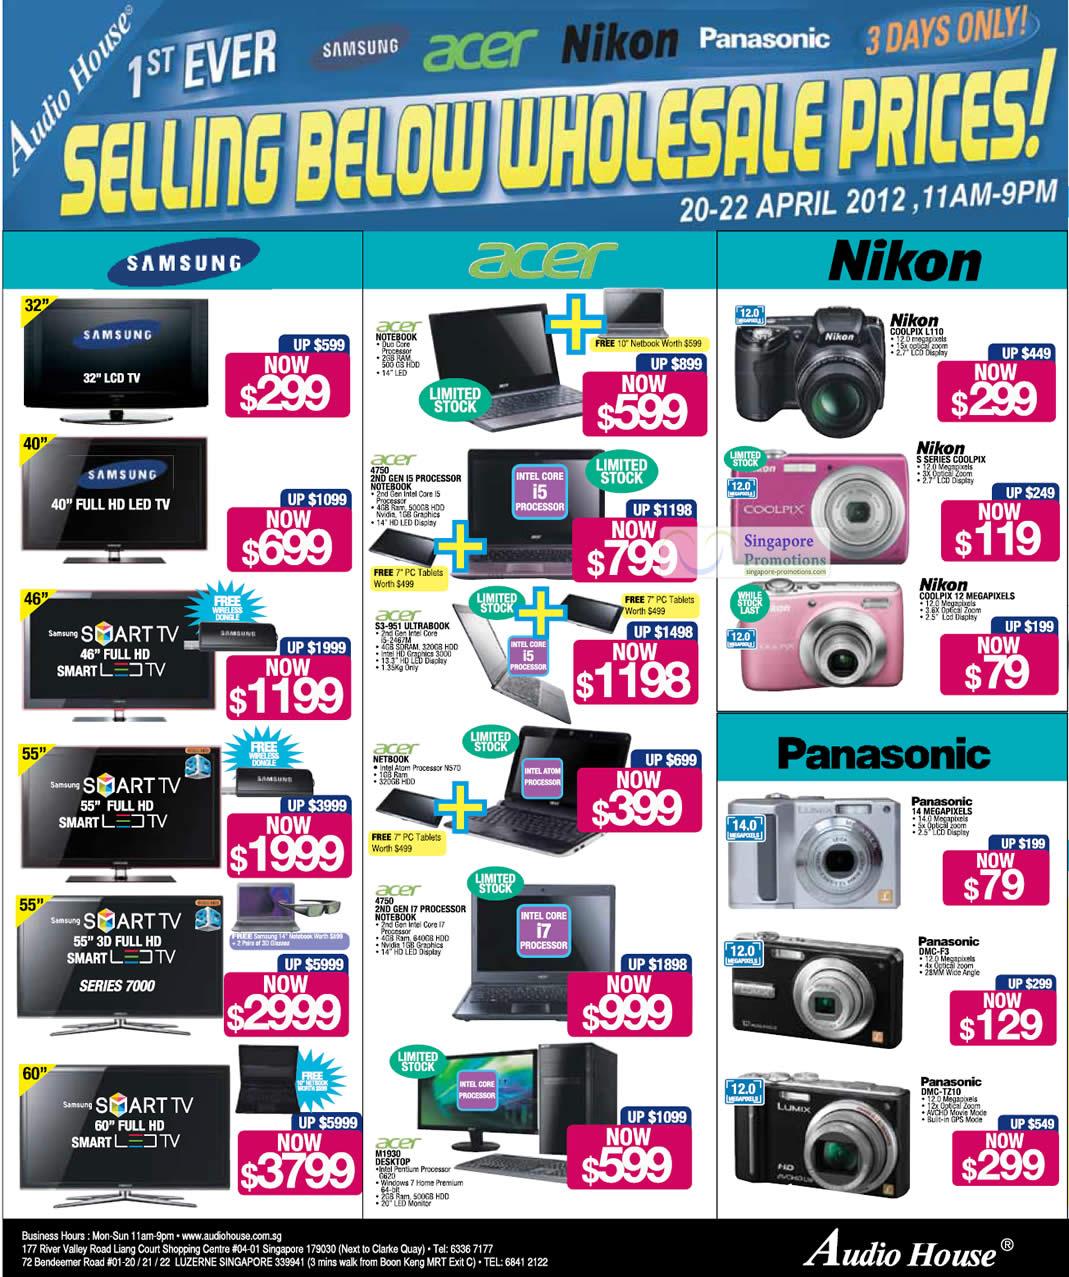 Acer M1930 Desktop PC, Acer S3-951 ULTRABOOK Notebook, Nikon COOLPIX L110 Digital Camera, Panasonic DMC-F3 Digital Camera, Panasonic DMC-TZ10 Digital Camera